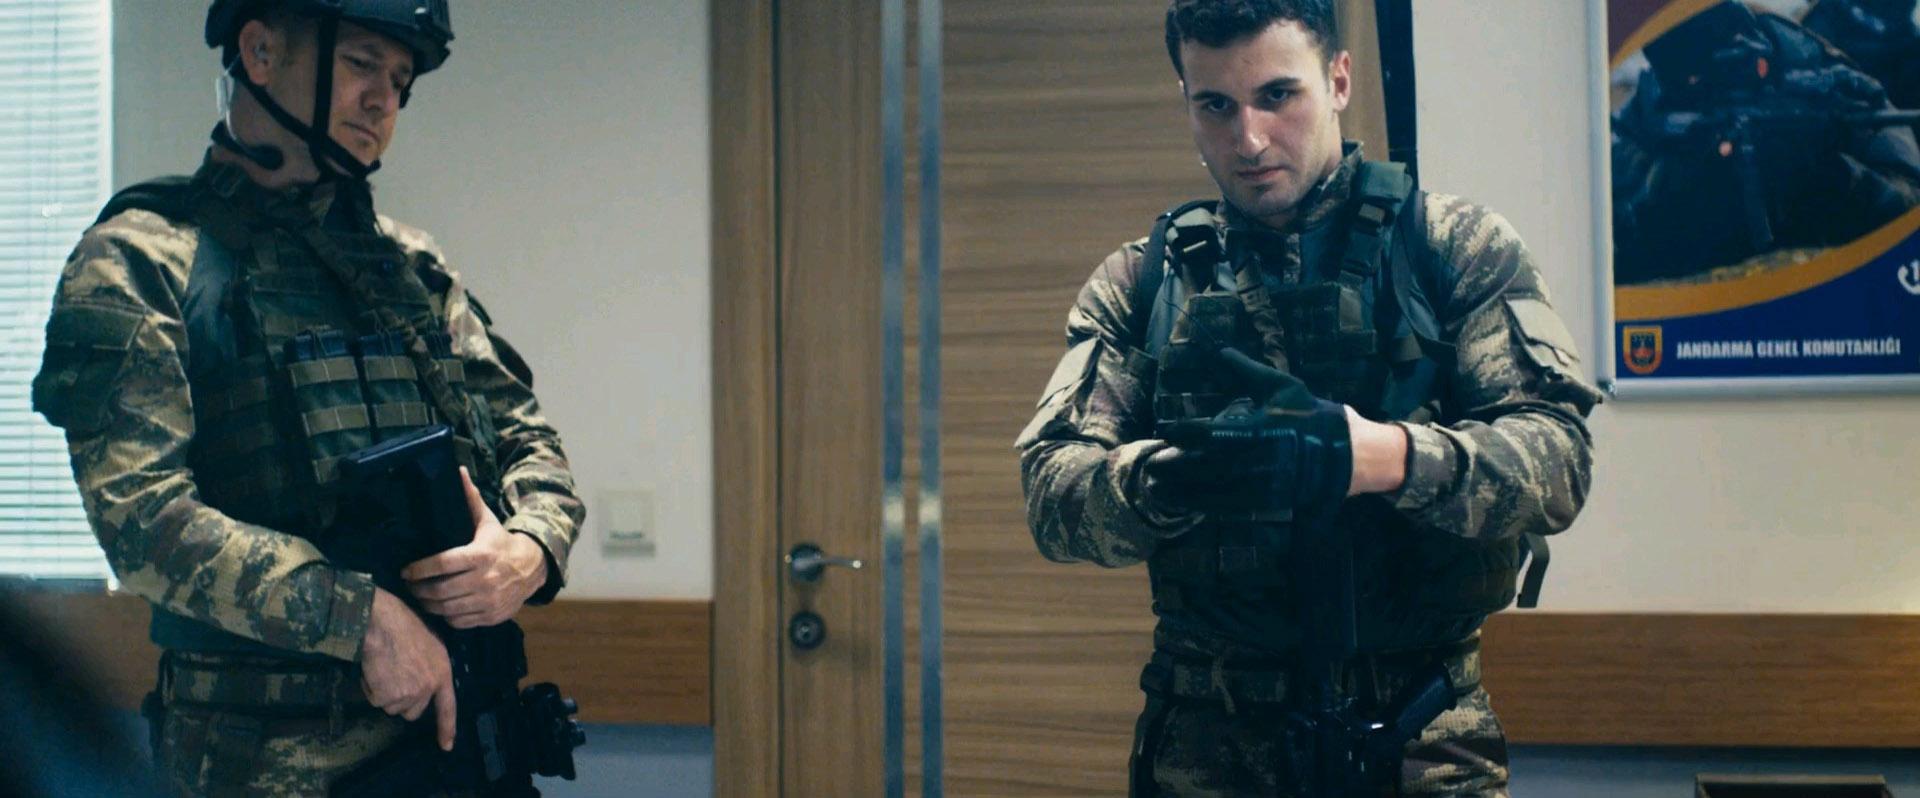 Börü | 2018 | Yerli Film | WEB-DL | XviD | Sansürsüz | 1080p - m720p - m1080p | WEB-DL | Tek Link